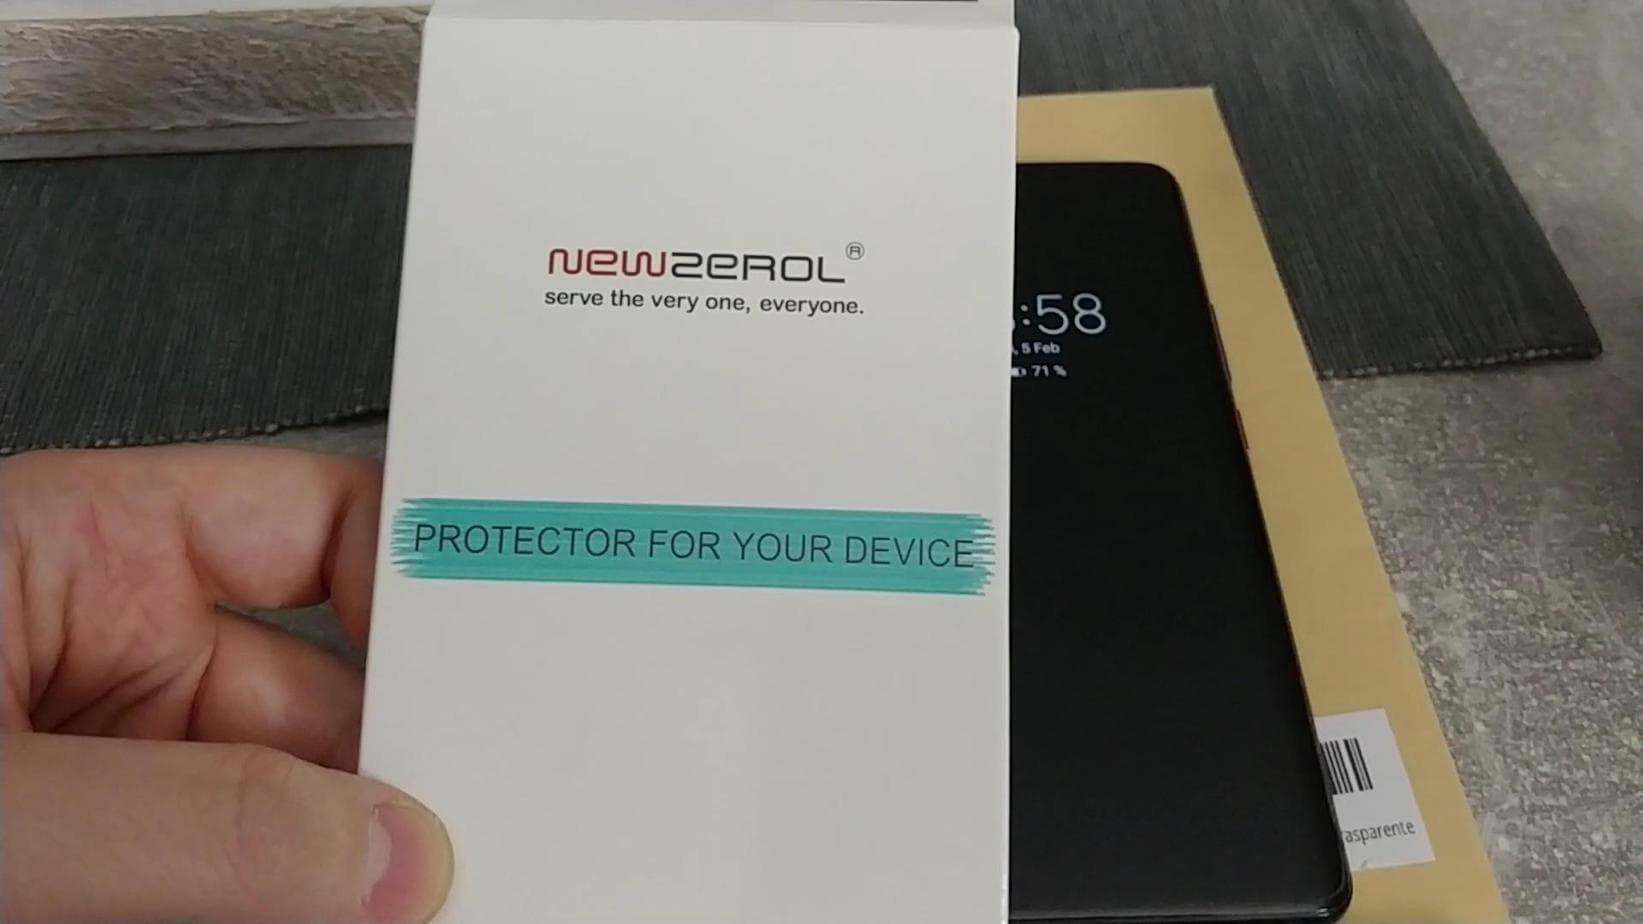 Huawei Mate 20 Pro Displayschutzfolie Test Verpackung